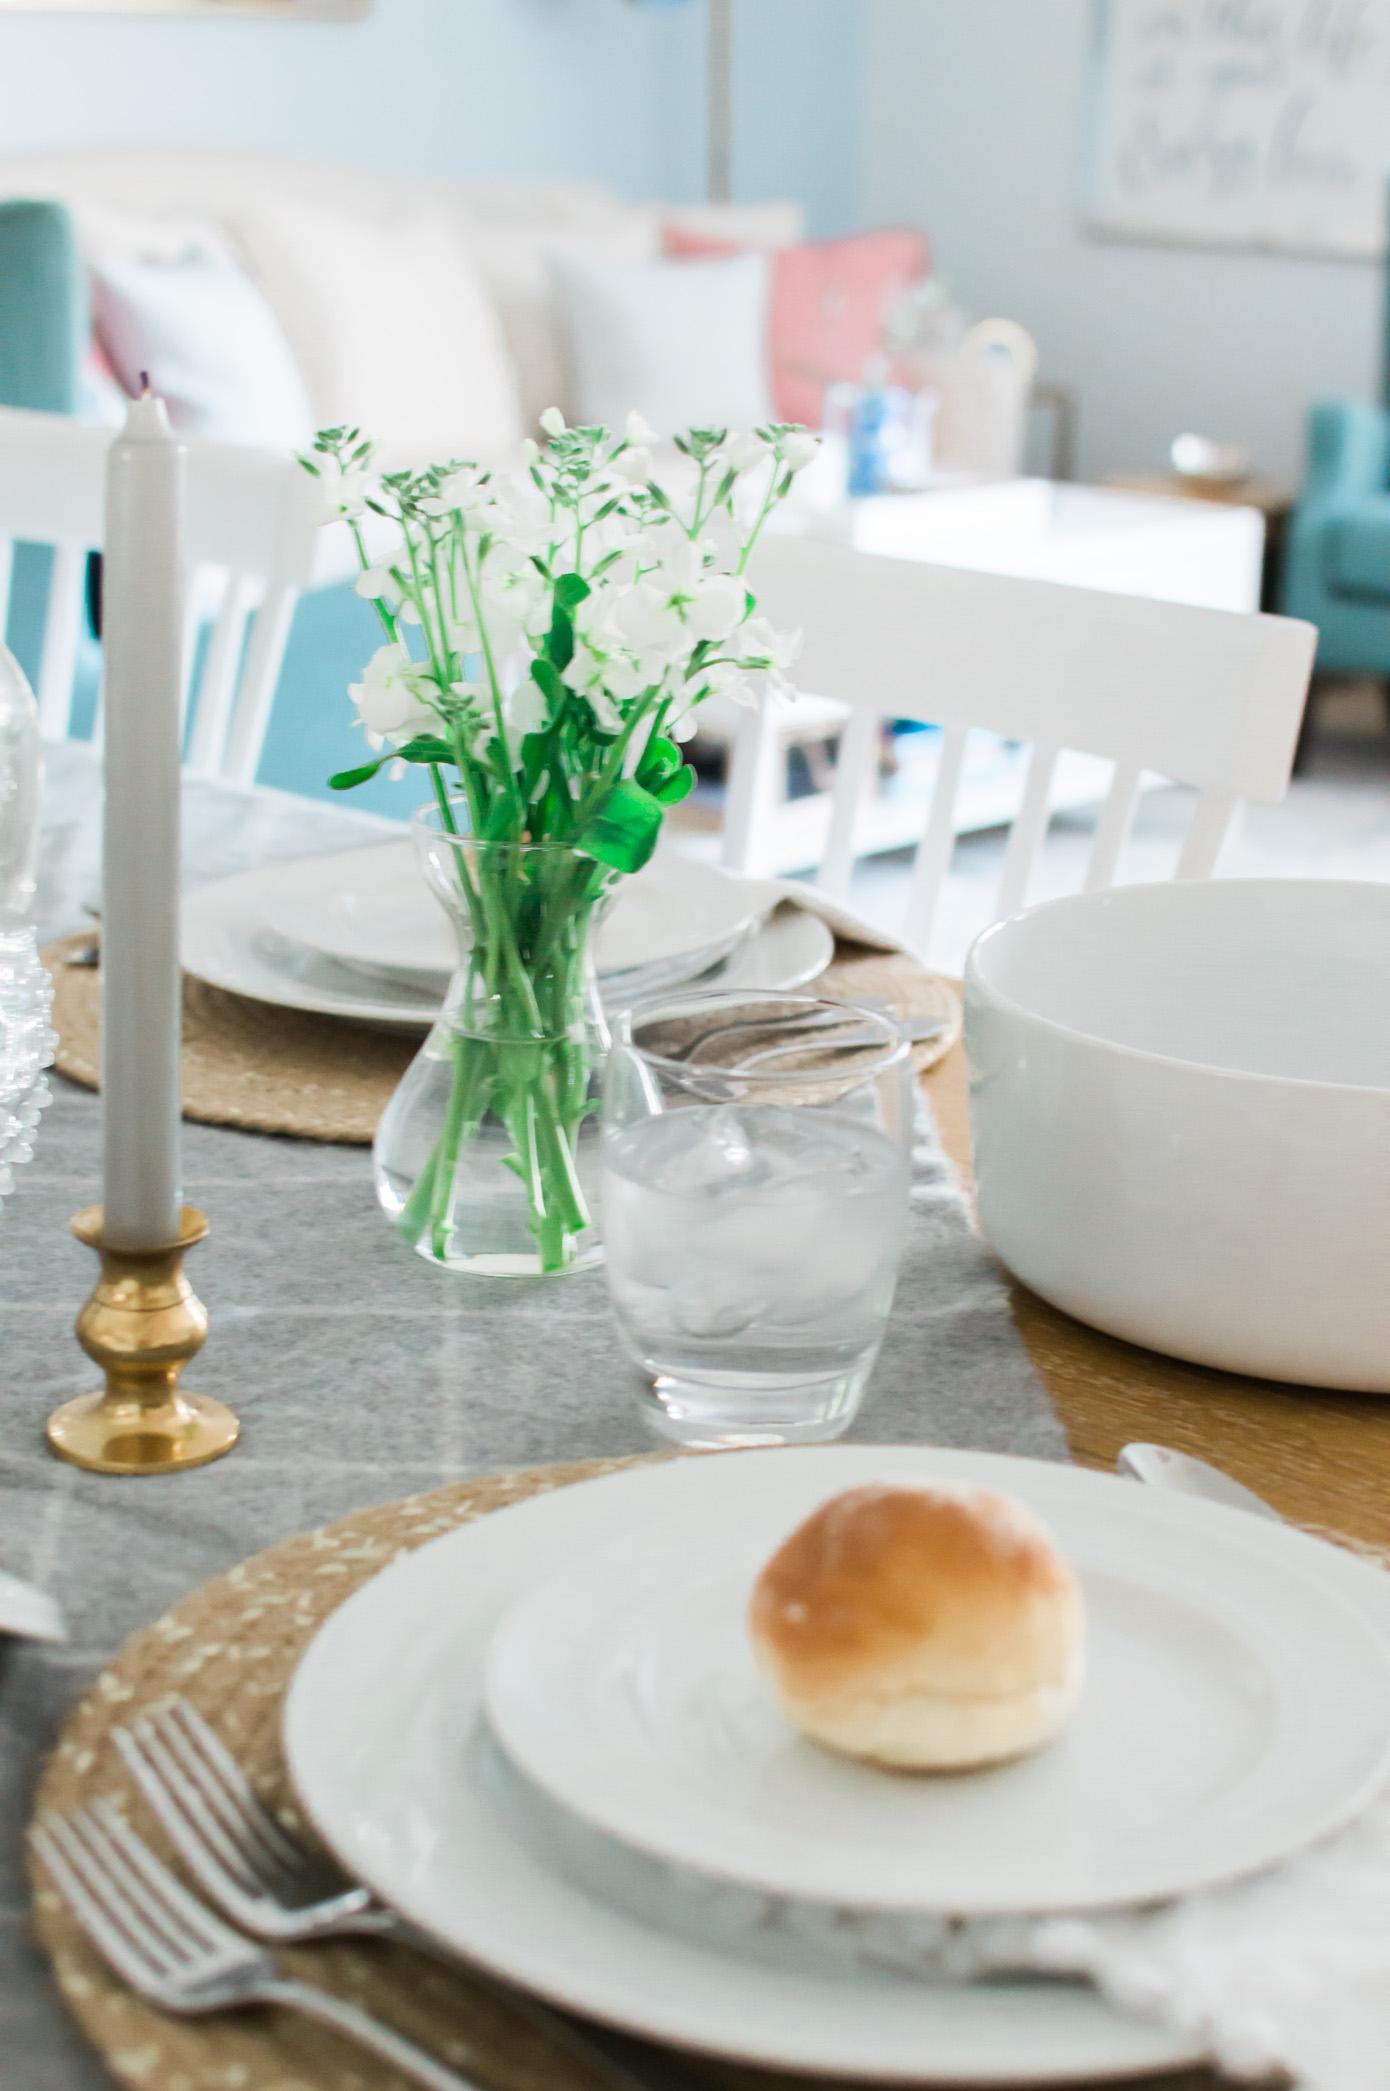 Friendsgiving Tablescape | Feminine Friendsgiving | Louella Reese Life & Style Blog